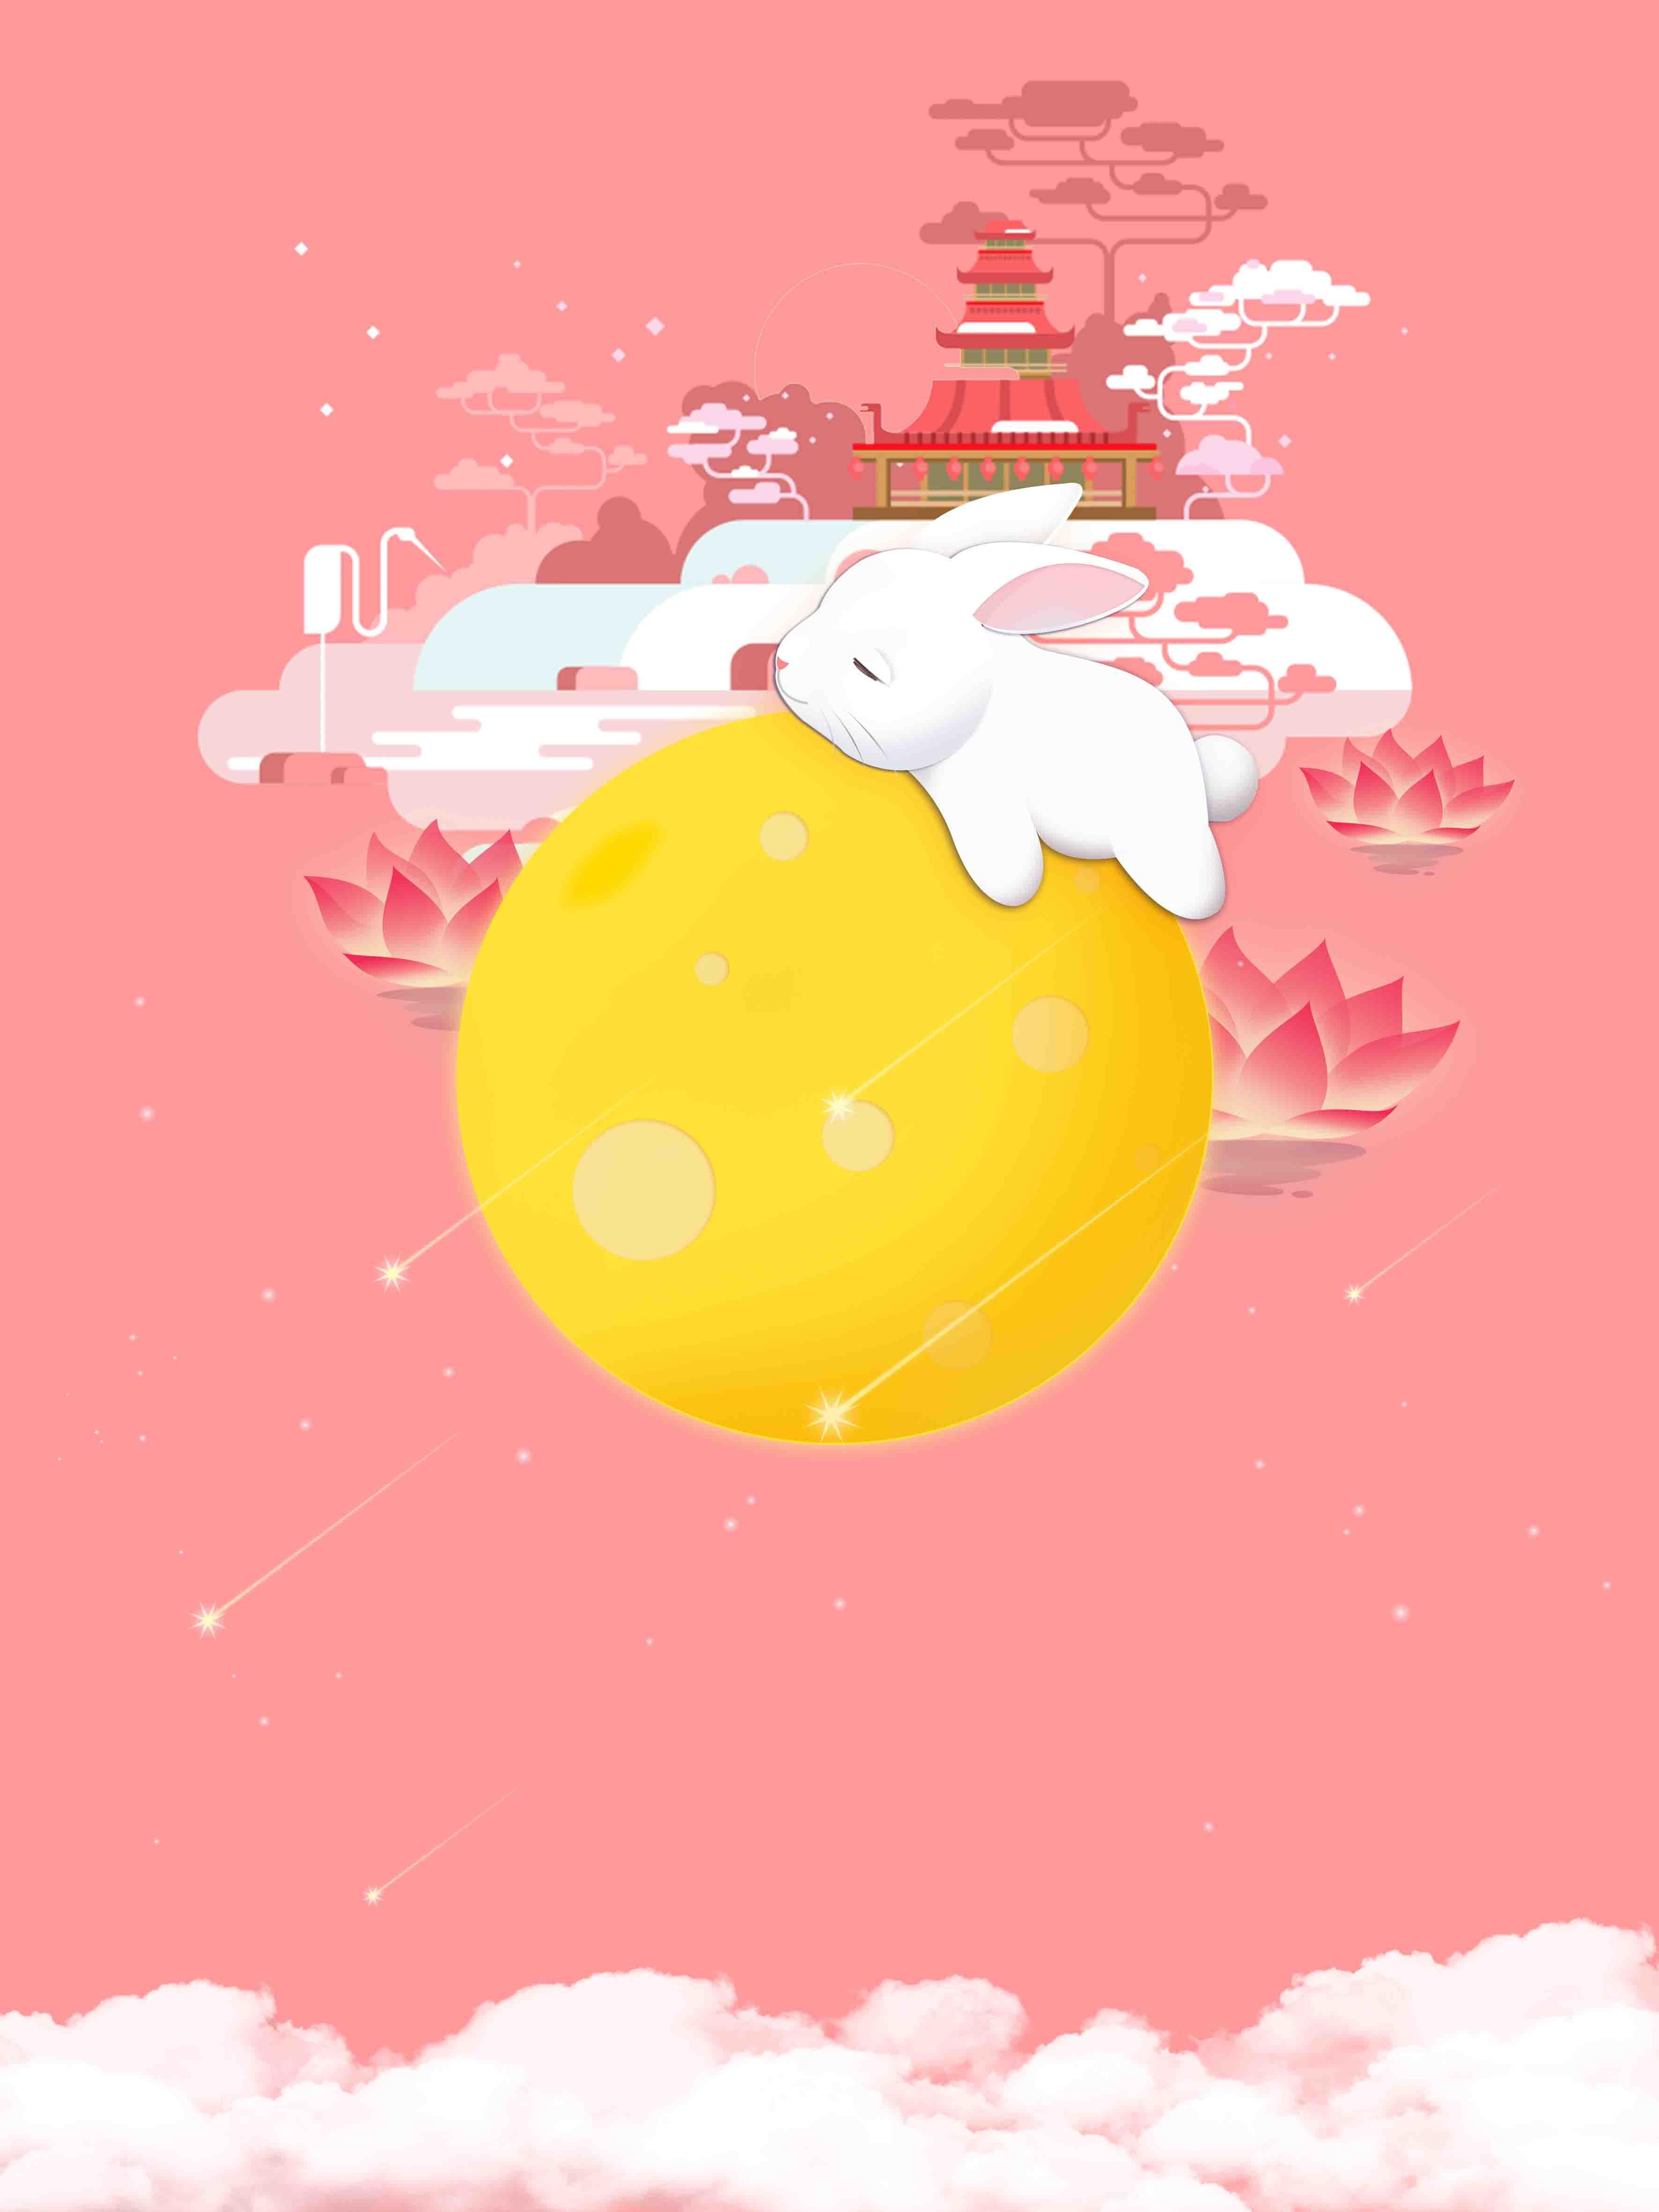 rose joli dessin du palais de festival de fond rose lapin